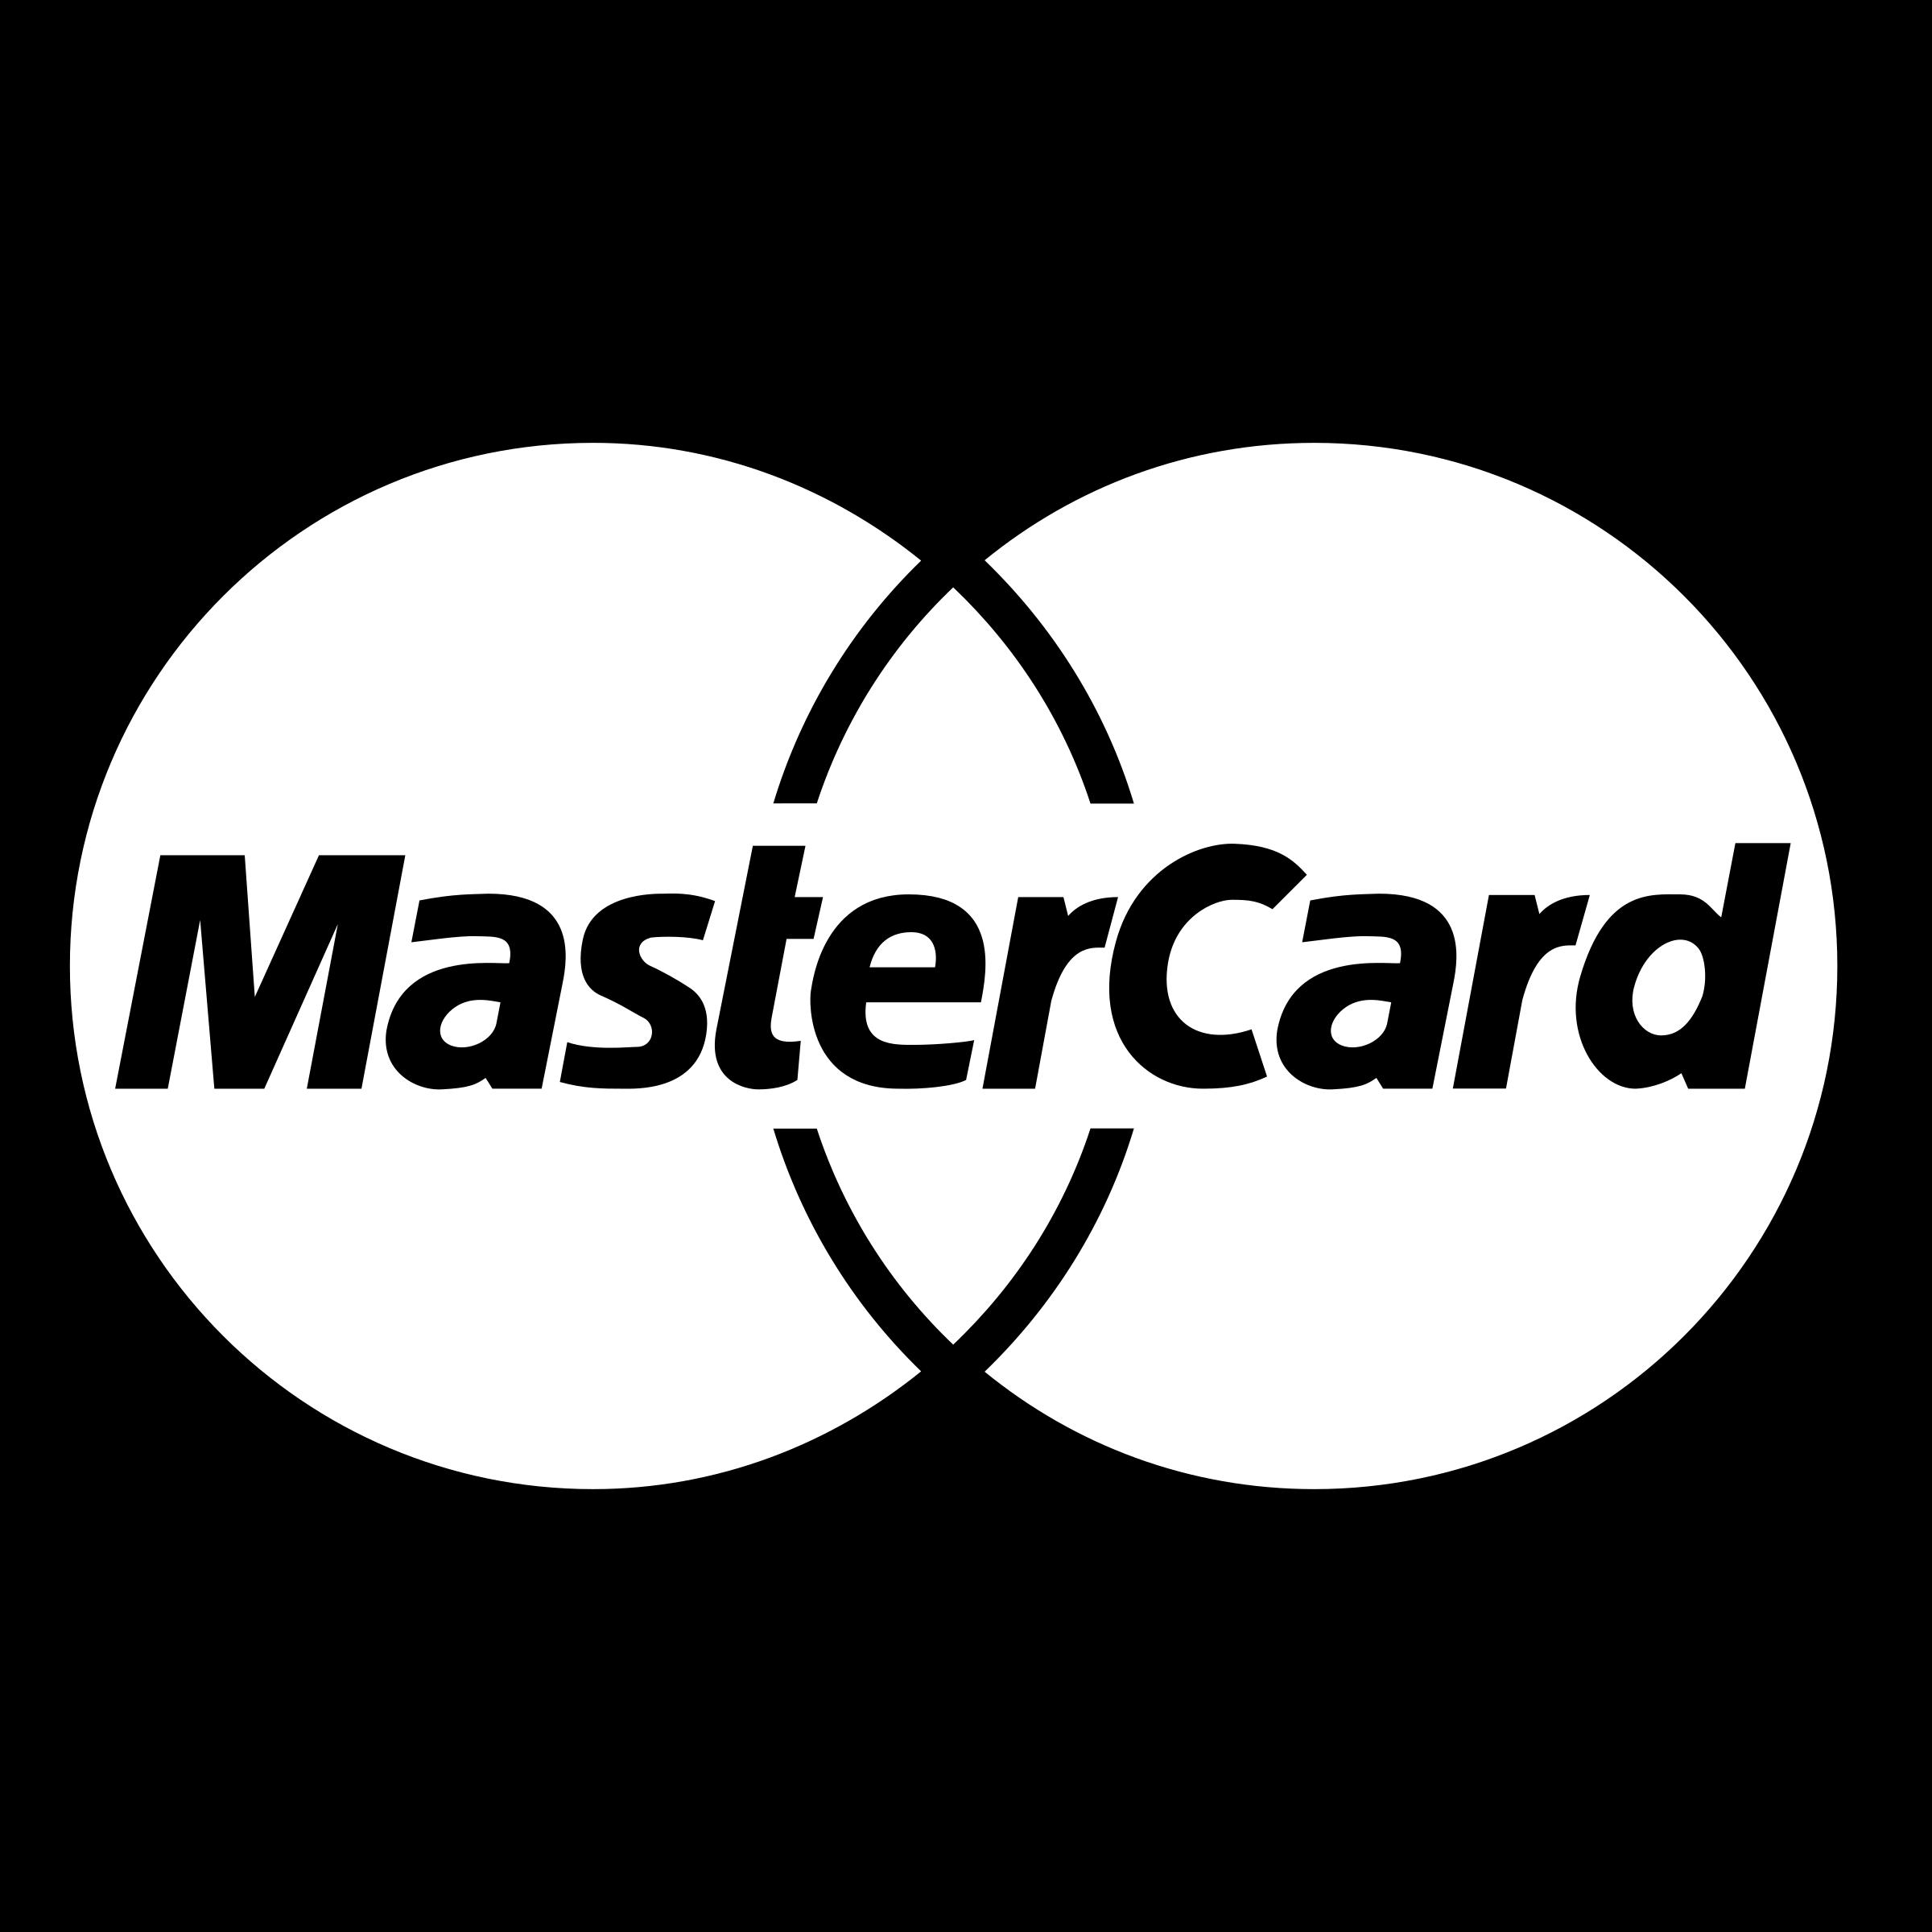 MasterCard Logo PNG Transparent & SVG Vector - Freebie Supply